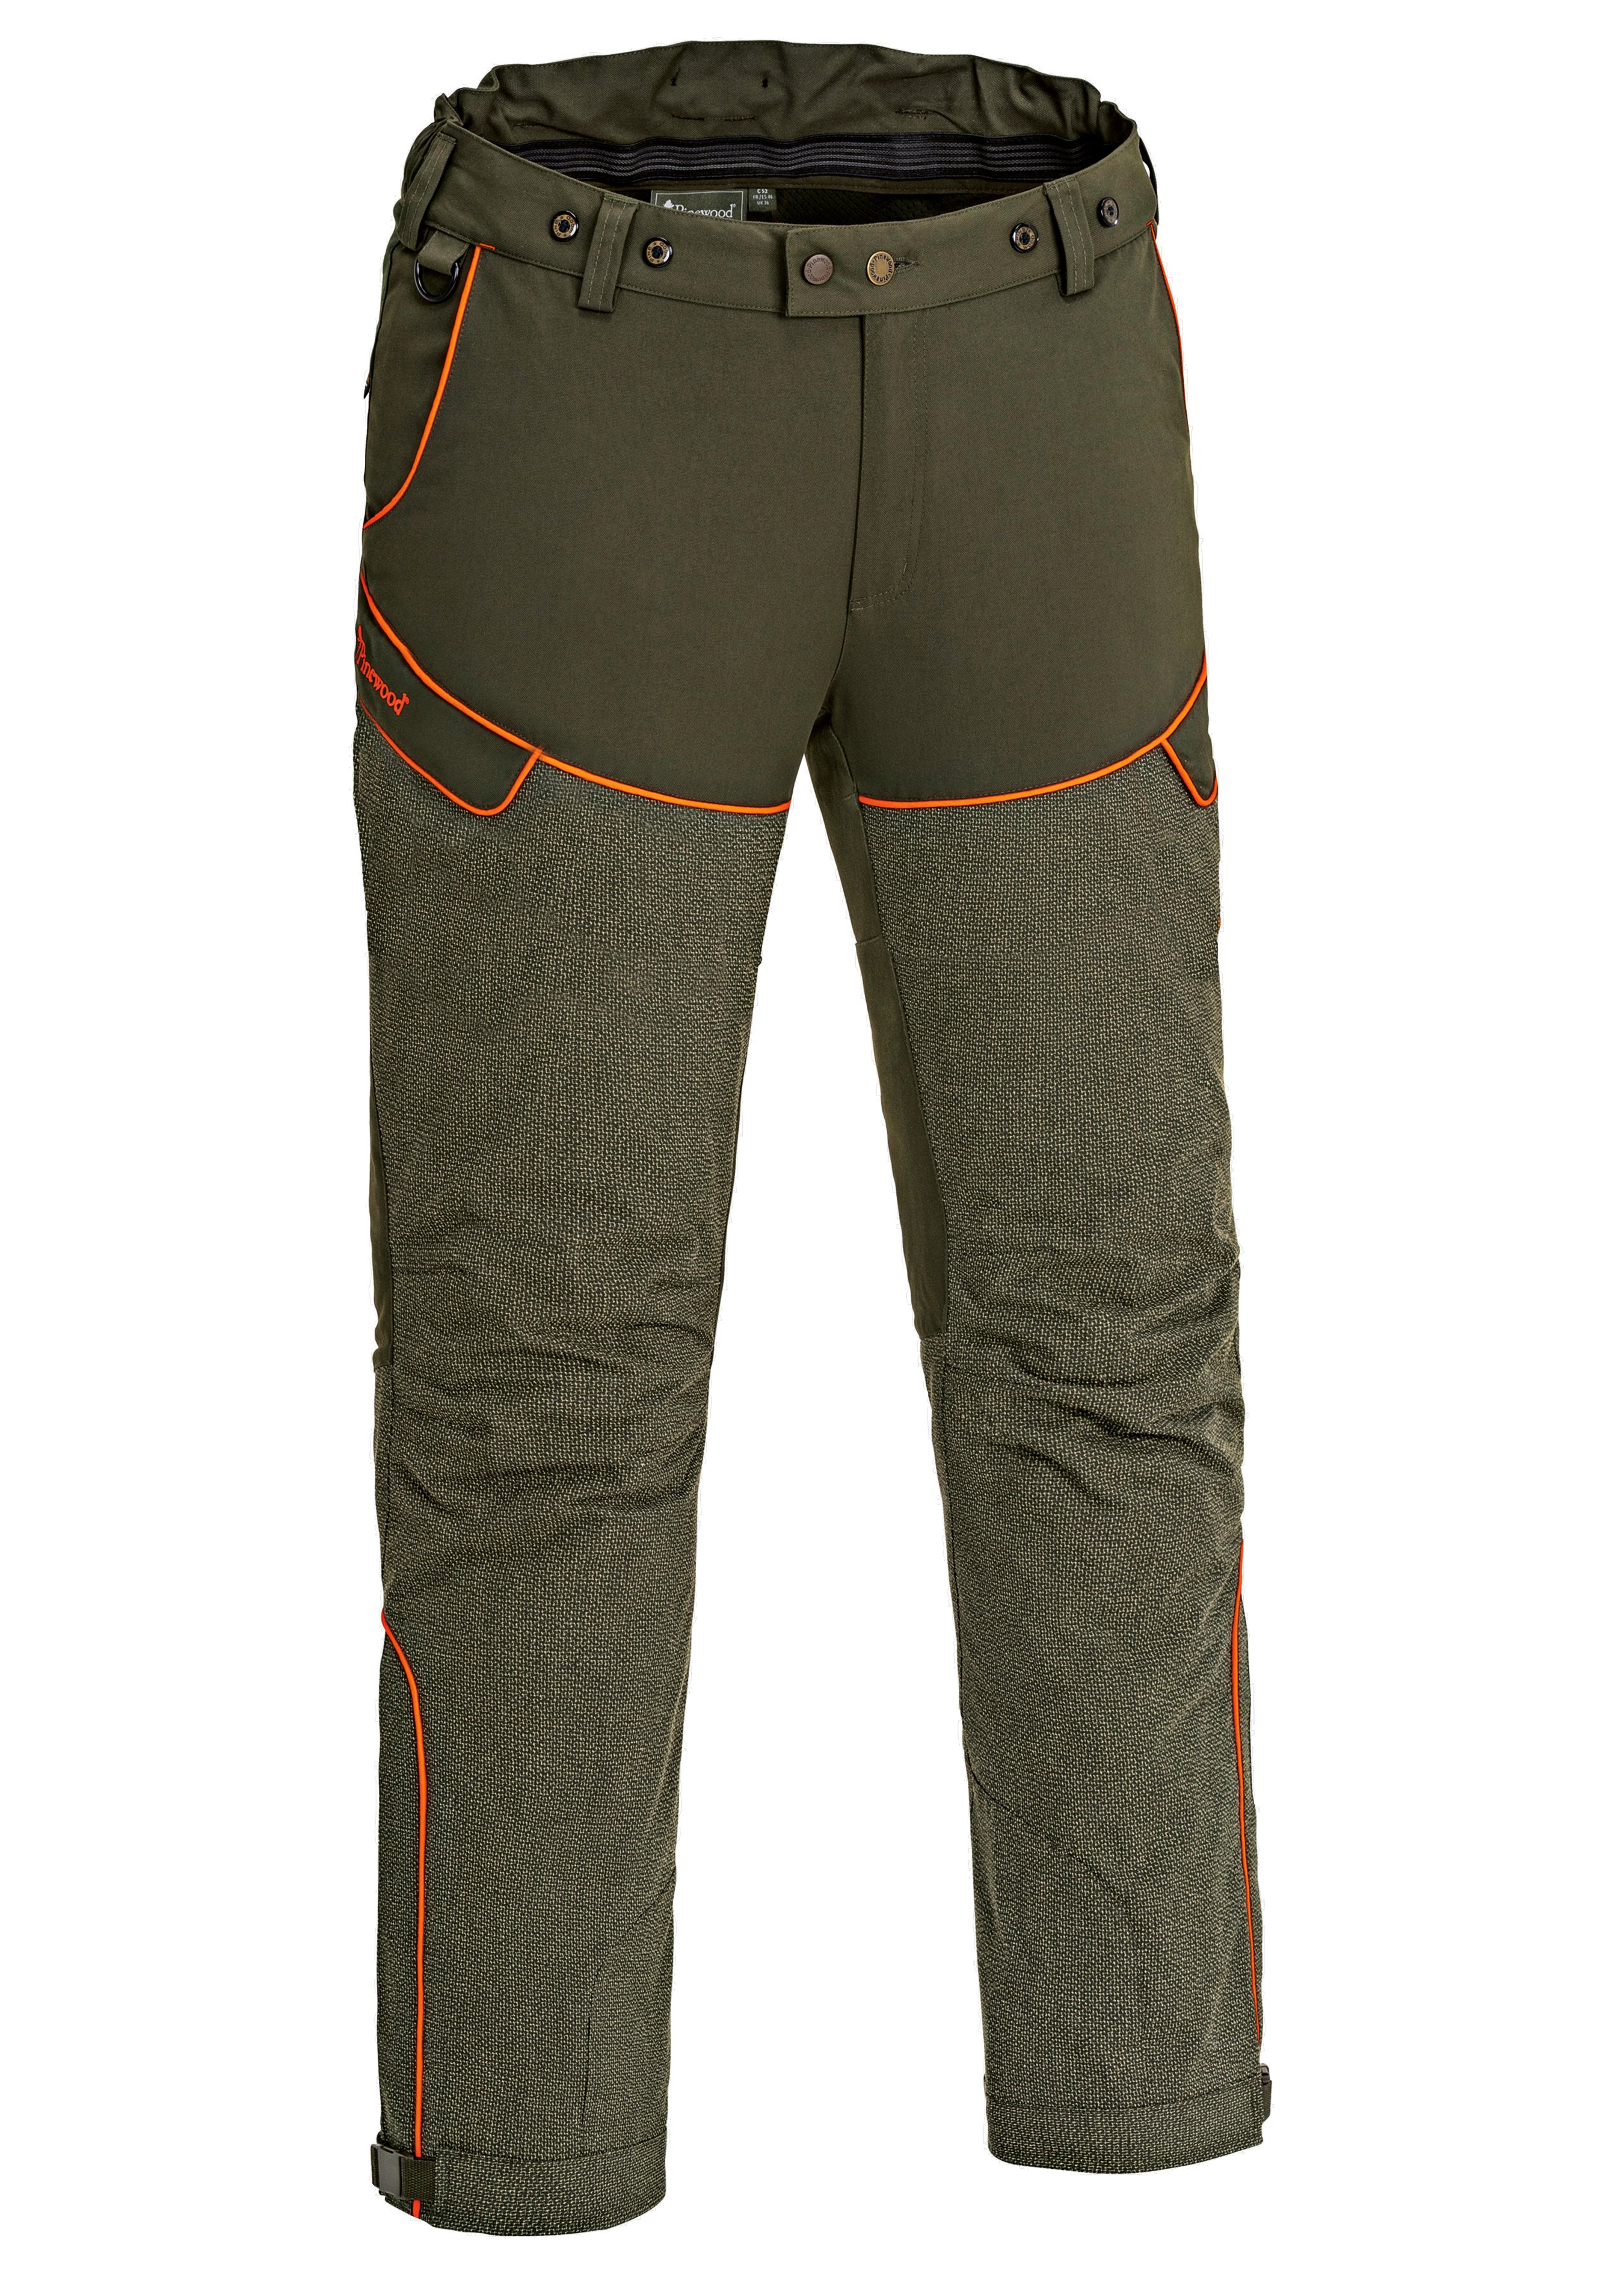 Pantalon de chasse Thorn anti-épines (5809) 28402454 1